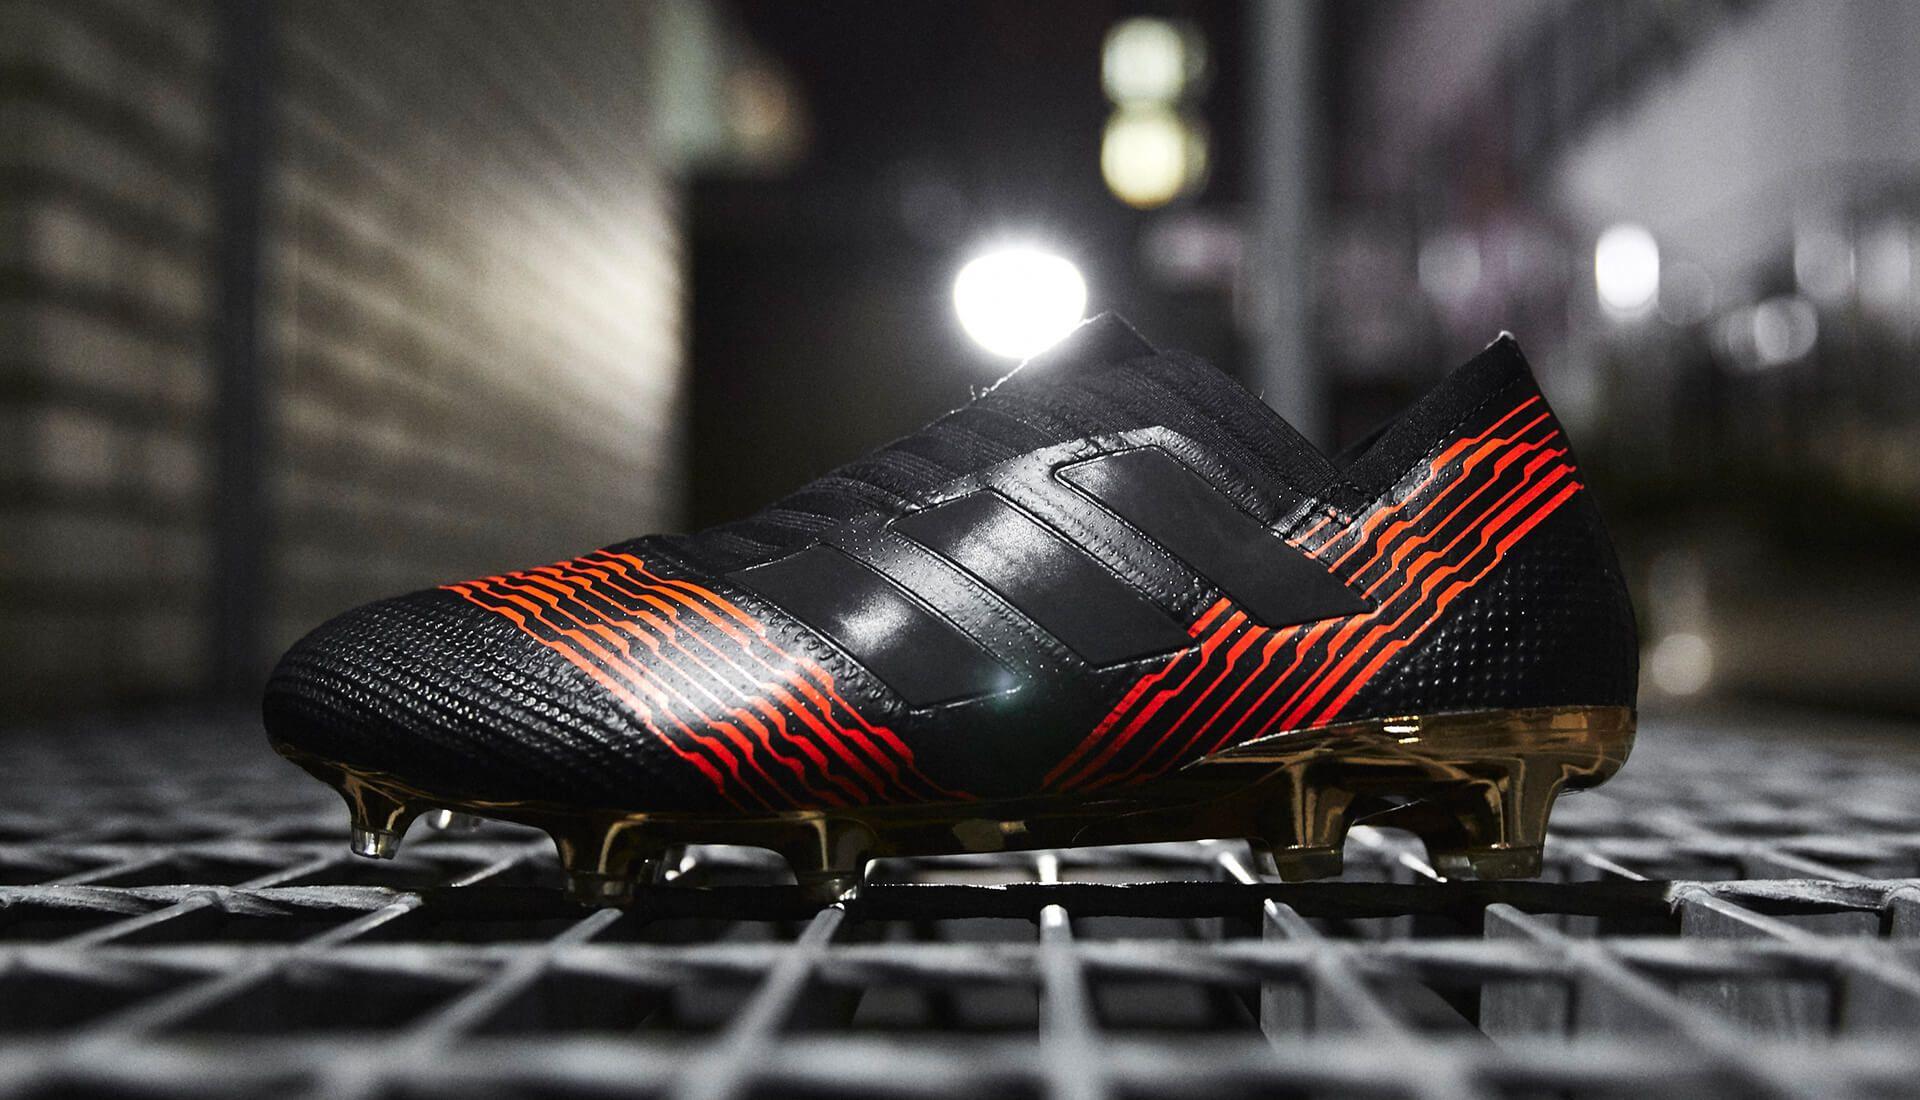 adidas NEMEZIZ Fussballschuhe günstig kaufen | 19+ | 19.1